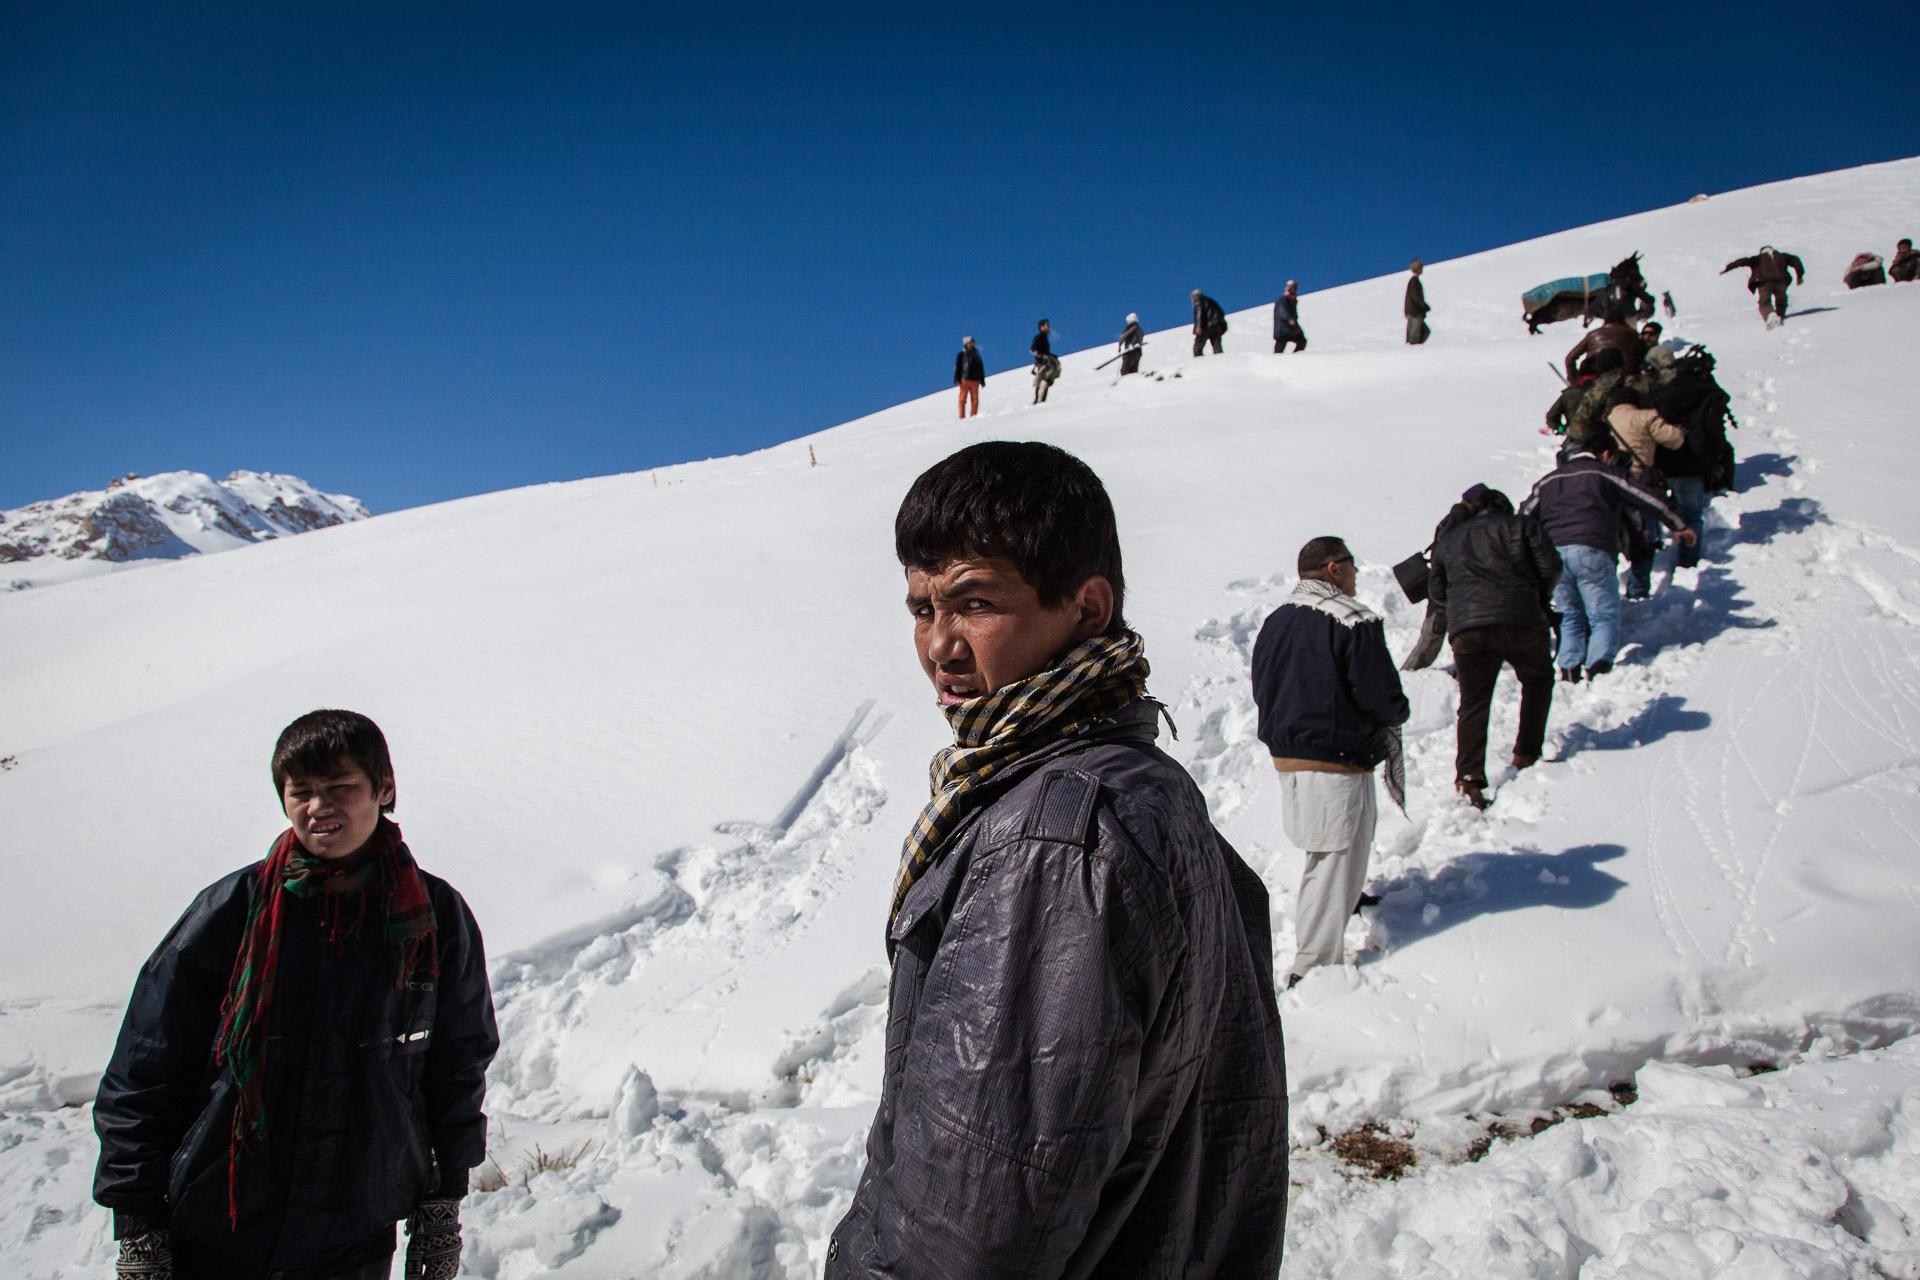 koh-e-baba, 1er Mars 2013. de jeunes afghans montent  vers le départ de l'afghan ski challenge.Koh-e-Baba, March 1, 2013. Young Afghans wlking to the start of the Afghan ski challenge.